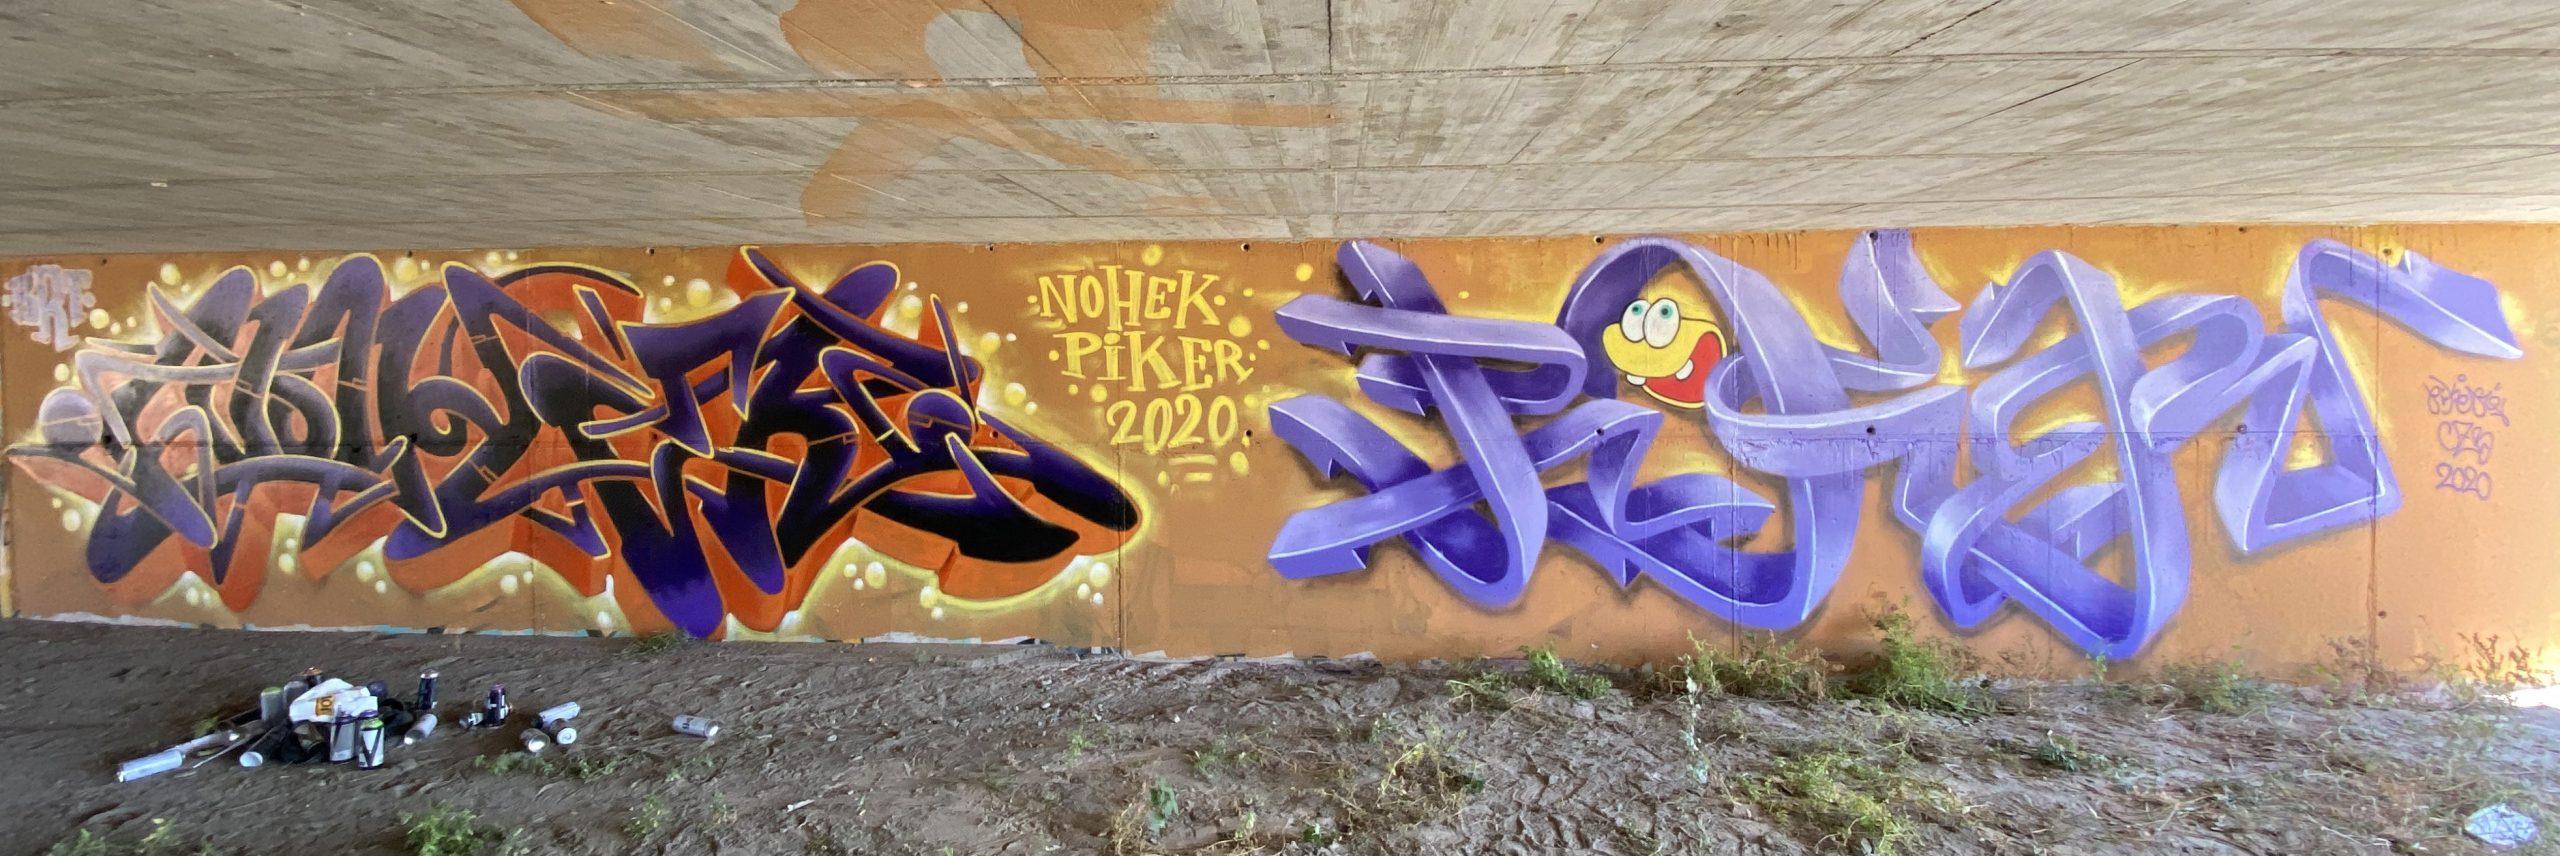 graffiti mural piker czb & nohek brt